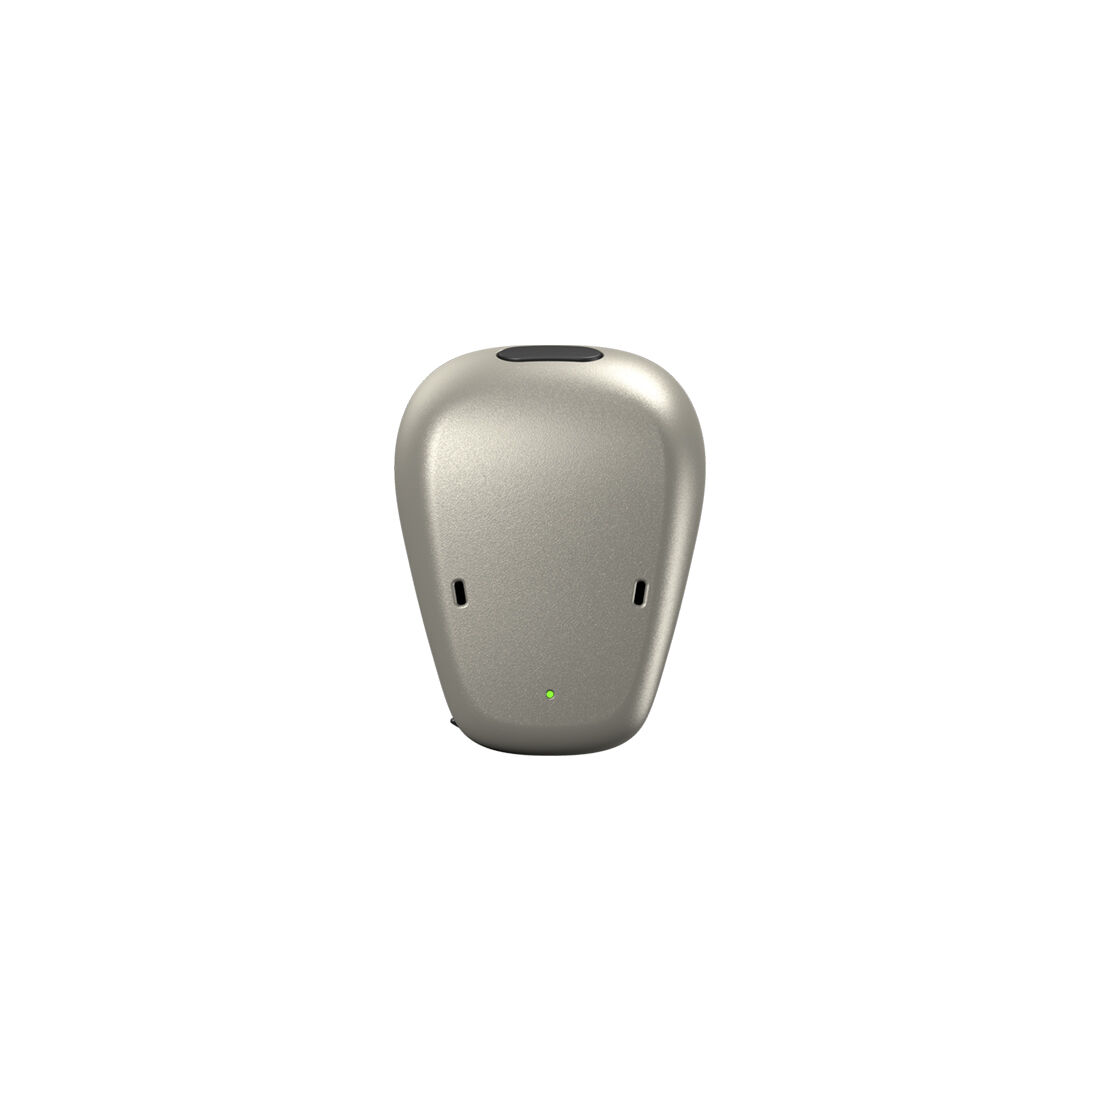 Baha 6 Max sound processor silver color